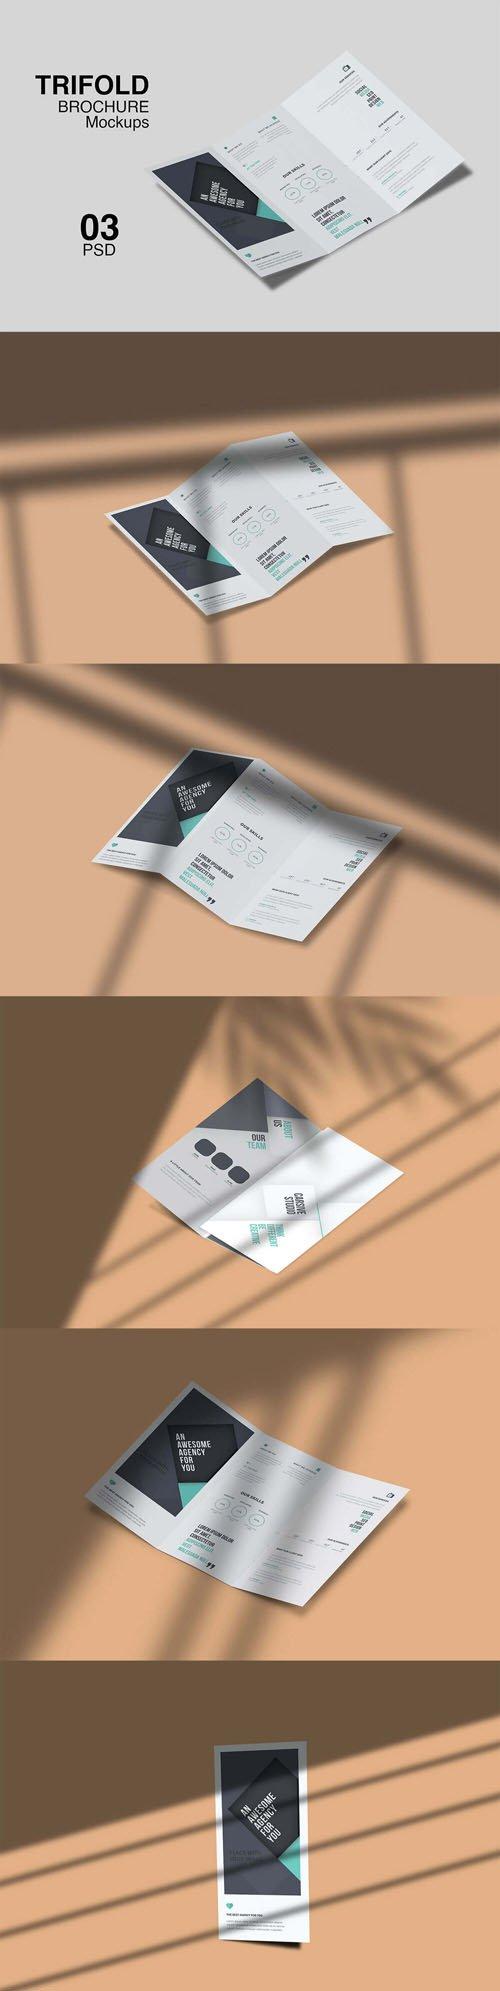 Tri-fold Brochure PSD Mockups Pack